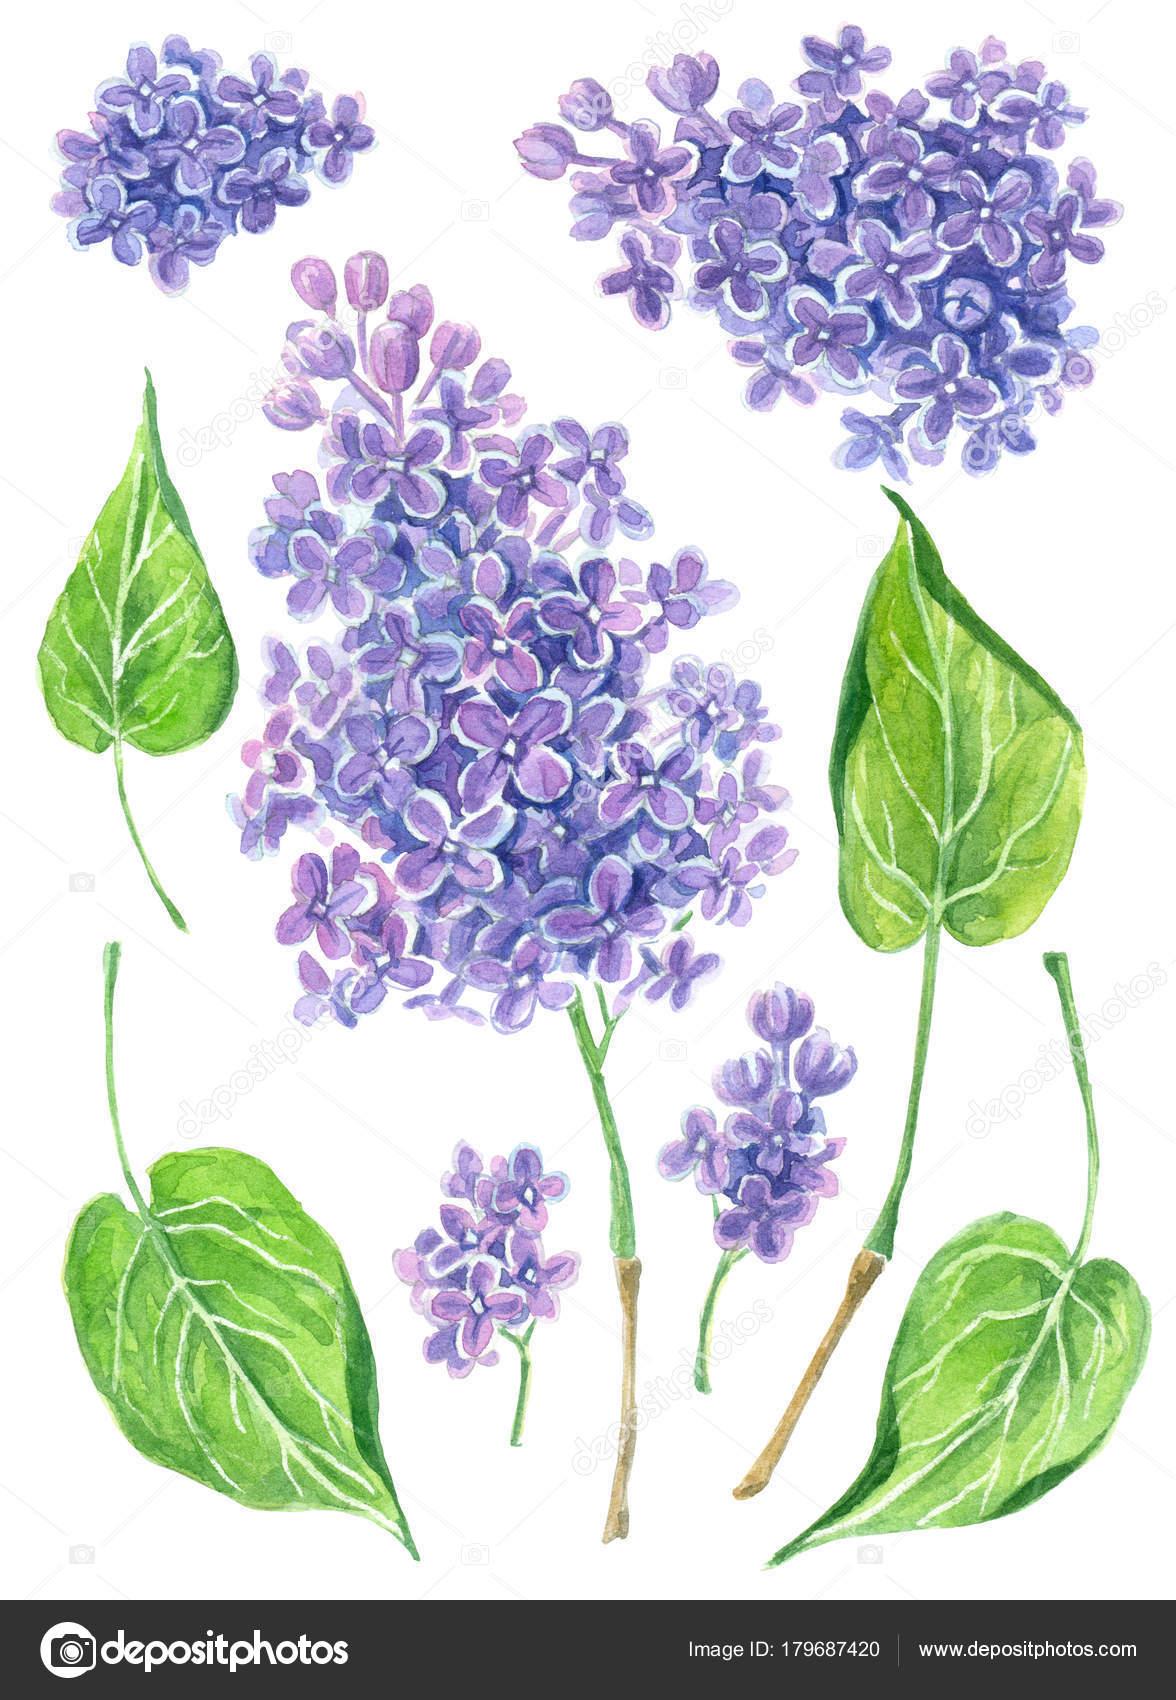 Satz von Aquarell lila Blumen — Stockfoto © katerinamk #179687420